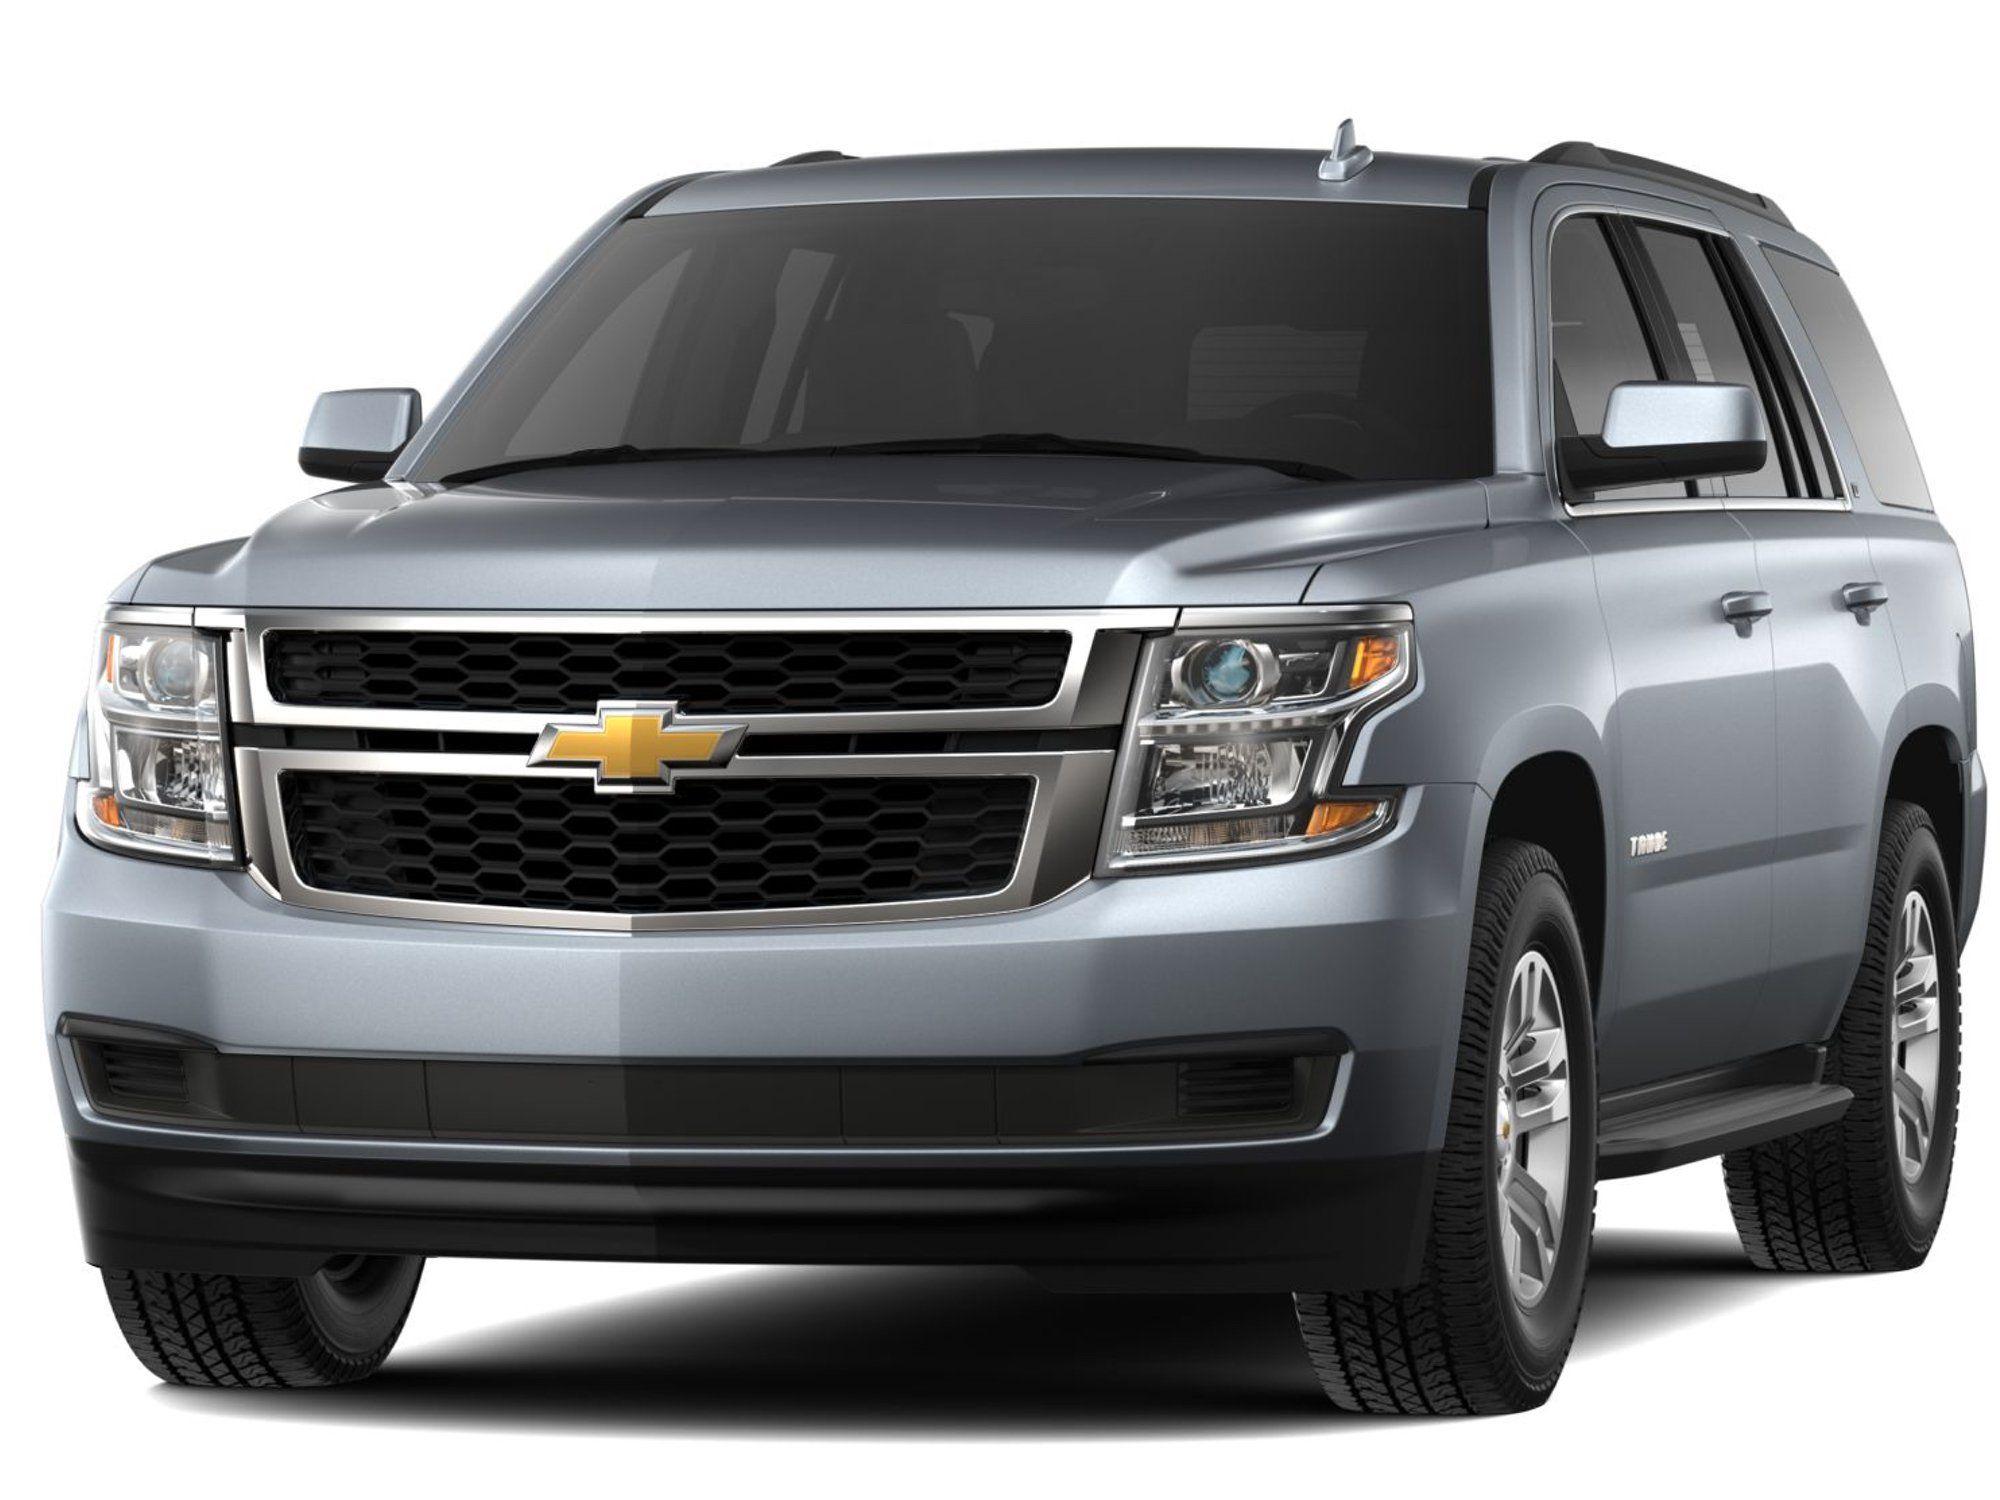 2019 Chevrolet Tahoe Exterior Colors Gm Authority